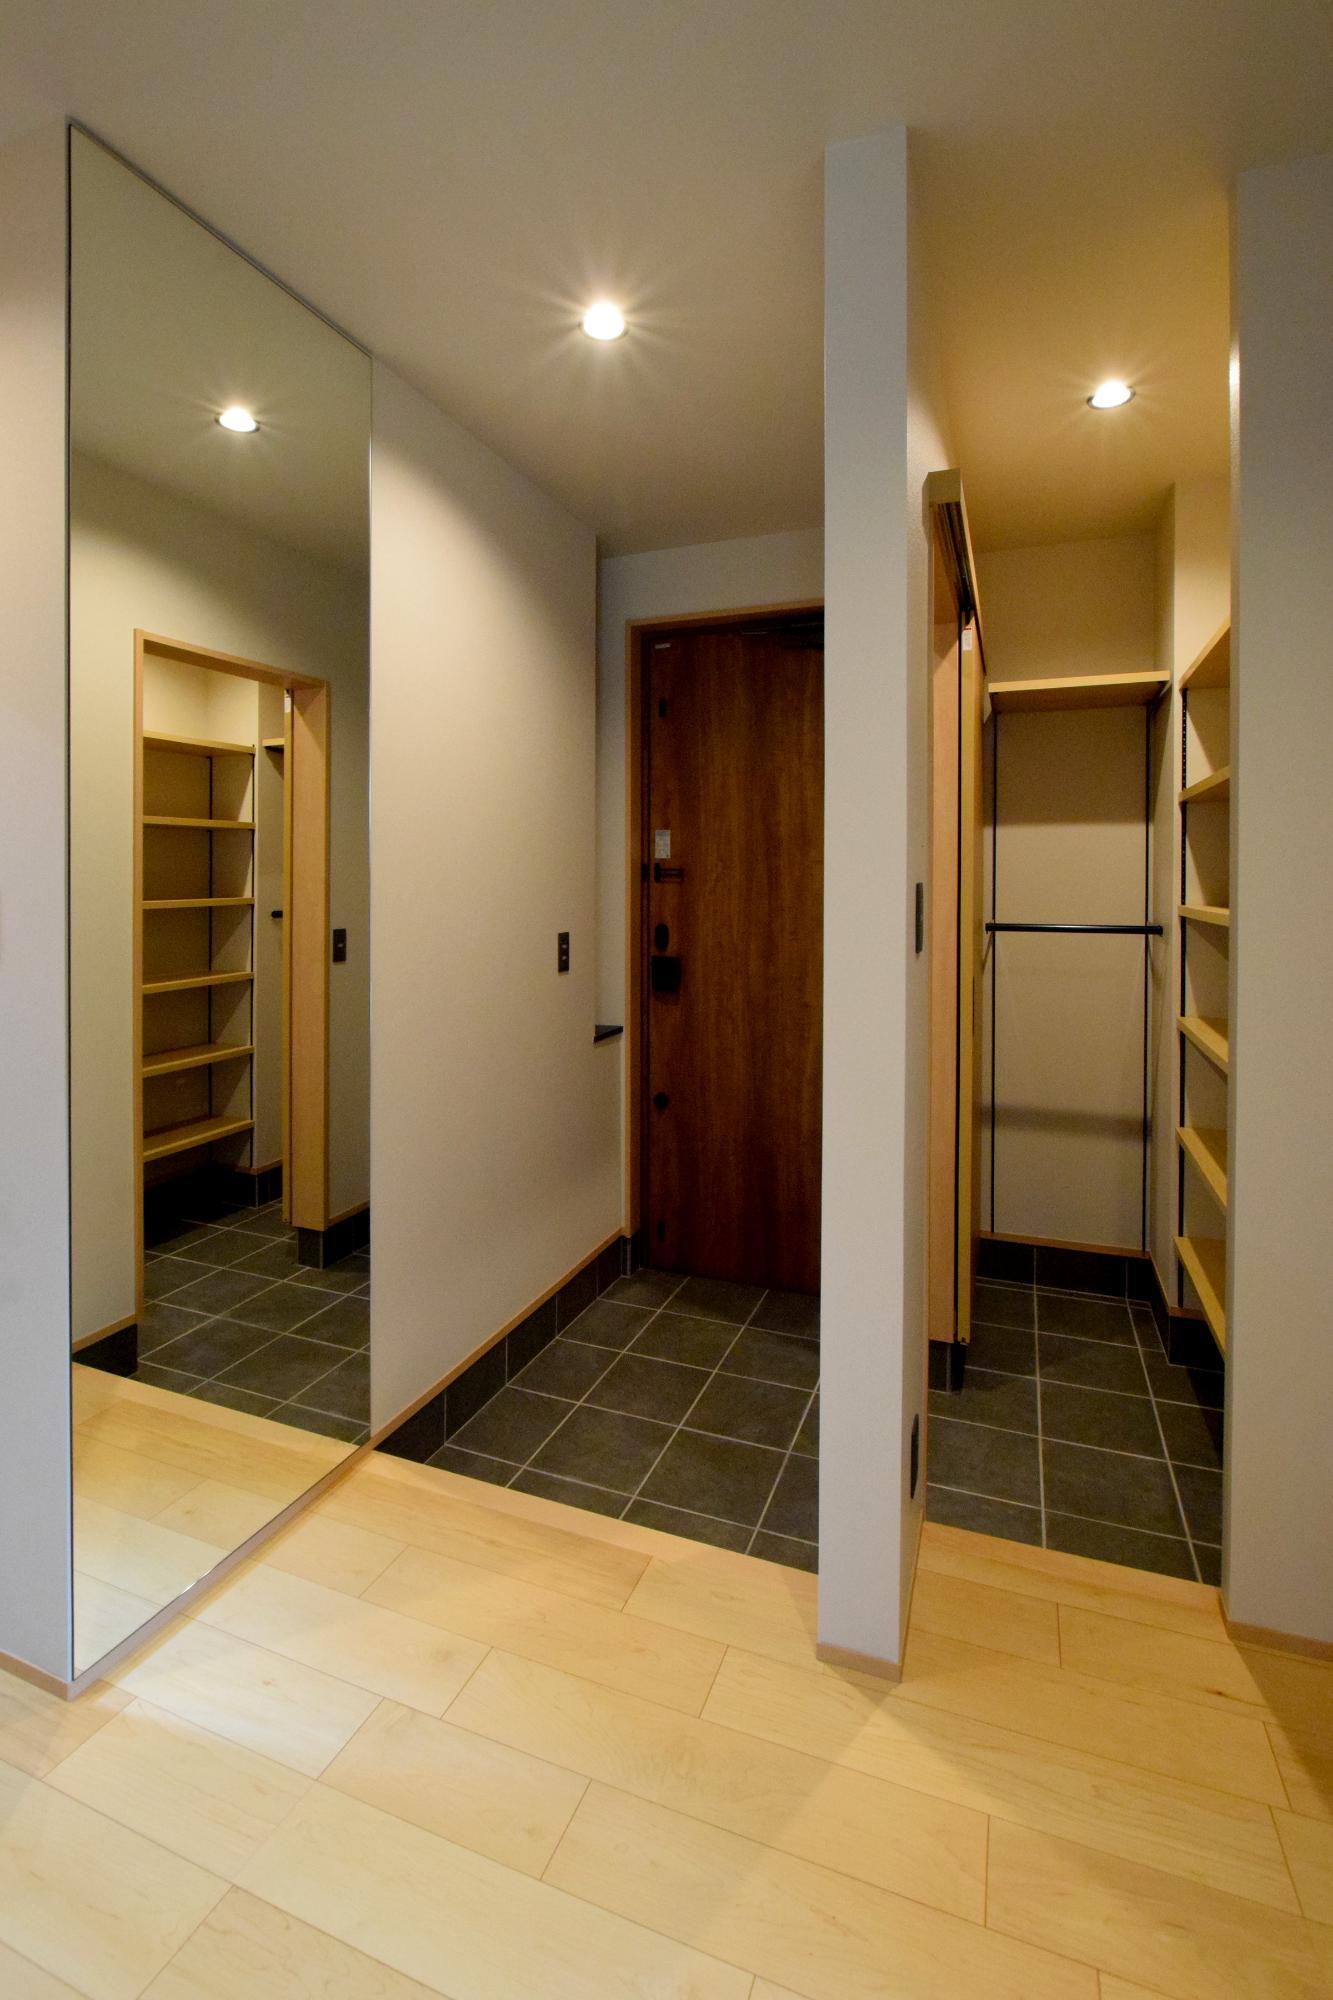 DETAIL HOME(ディテールホーム)「ハコ型という選択×耐震3の家」のシンプル・ナチュラルな玄関の実例写真